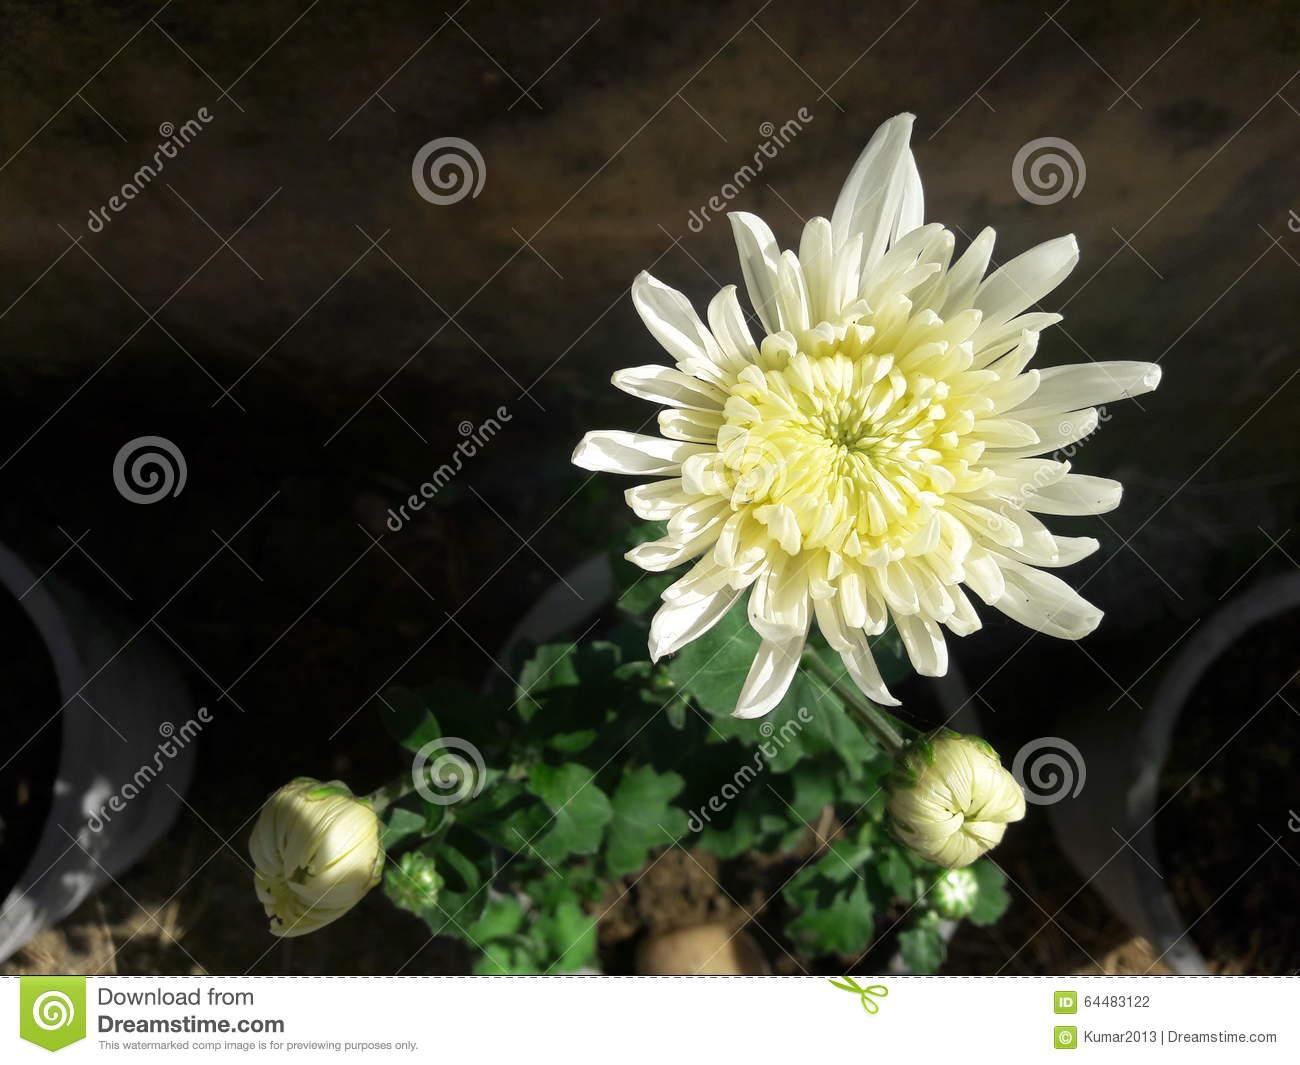 White Crysanthemum Flower Close Up Stock Photo.